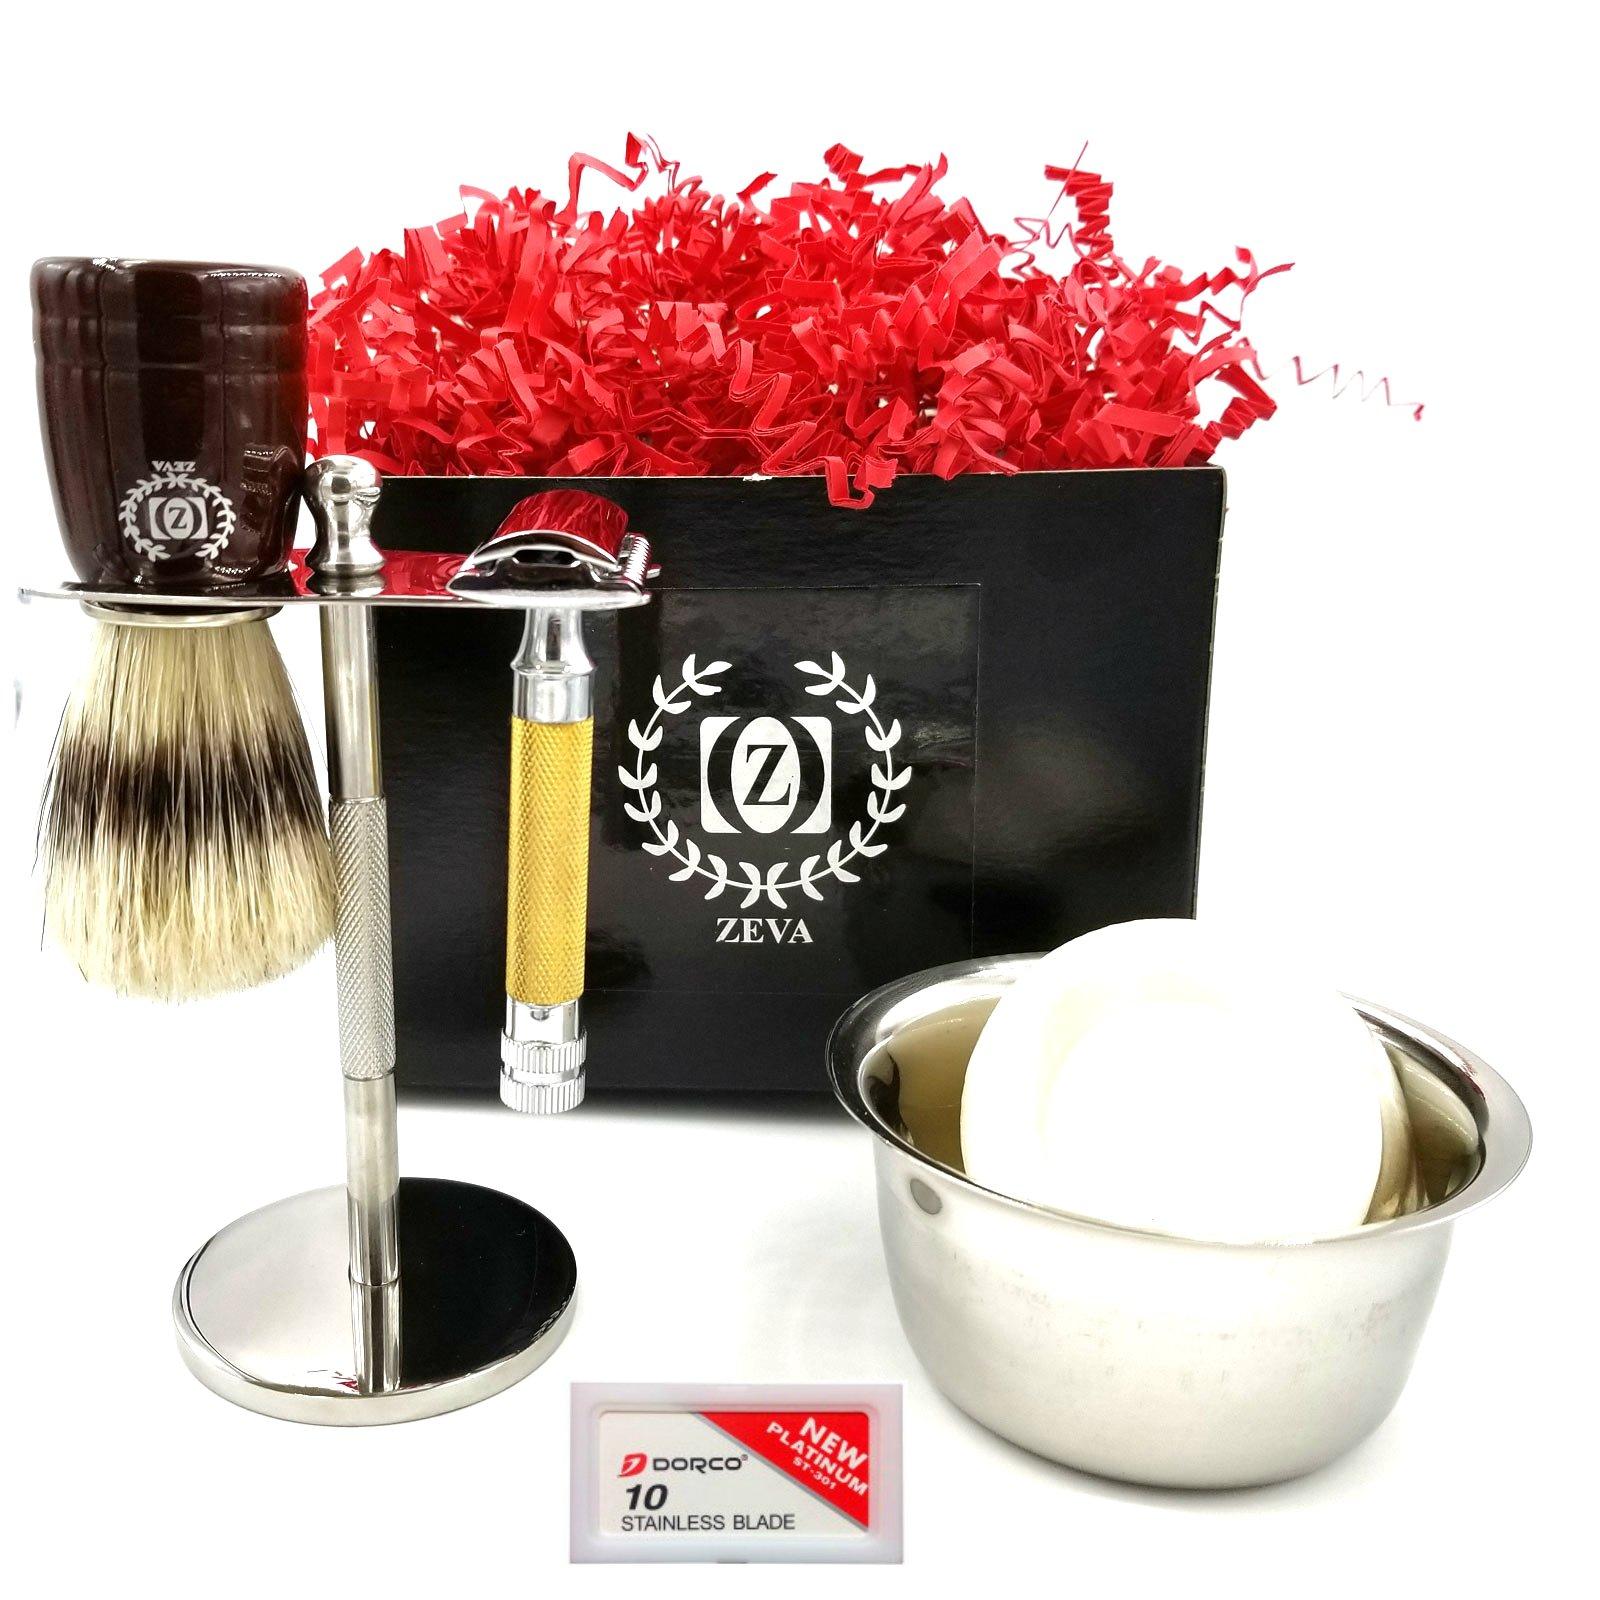 Badger Shaving Brush ZEVA Men Shaving Set Gold Handle DE Safety Razor Complete grooming kit sensitive skin with 10 Dorco Blades